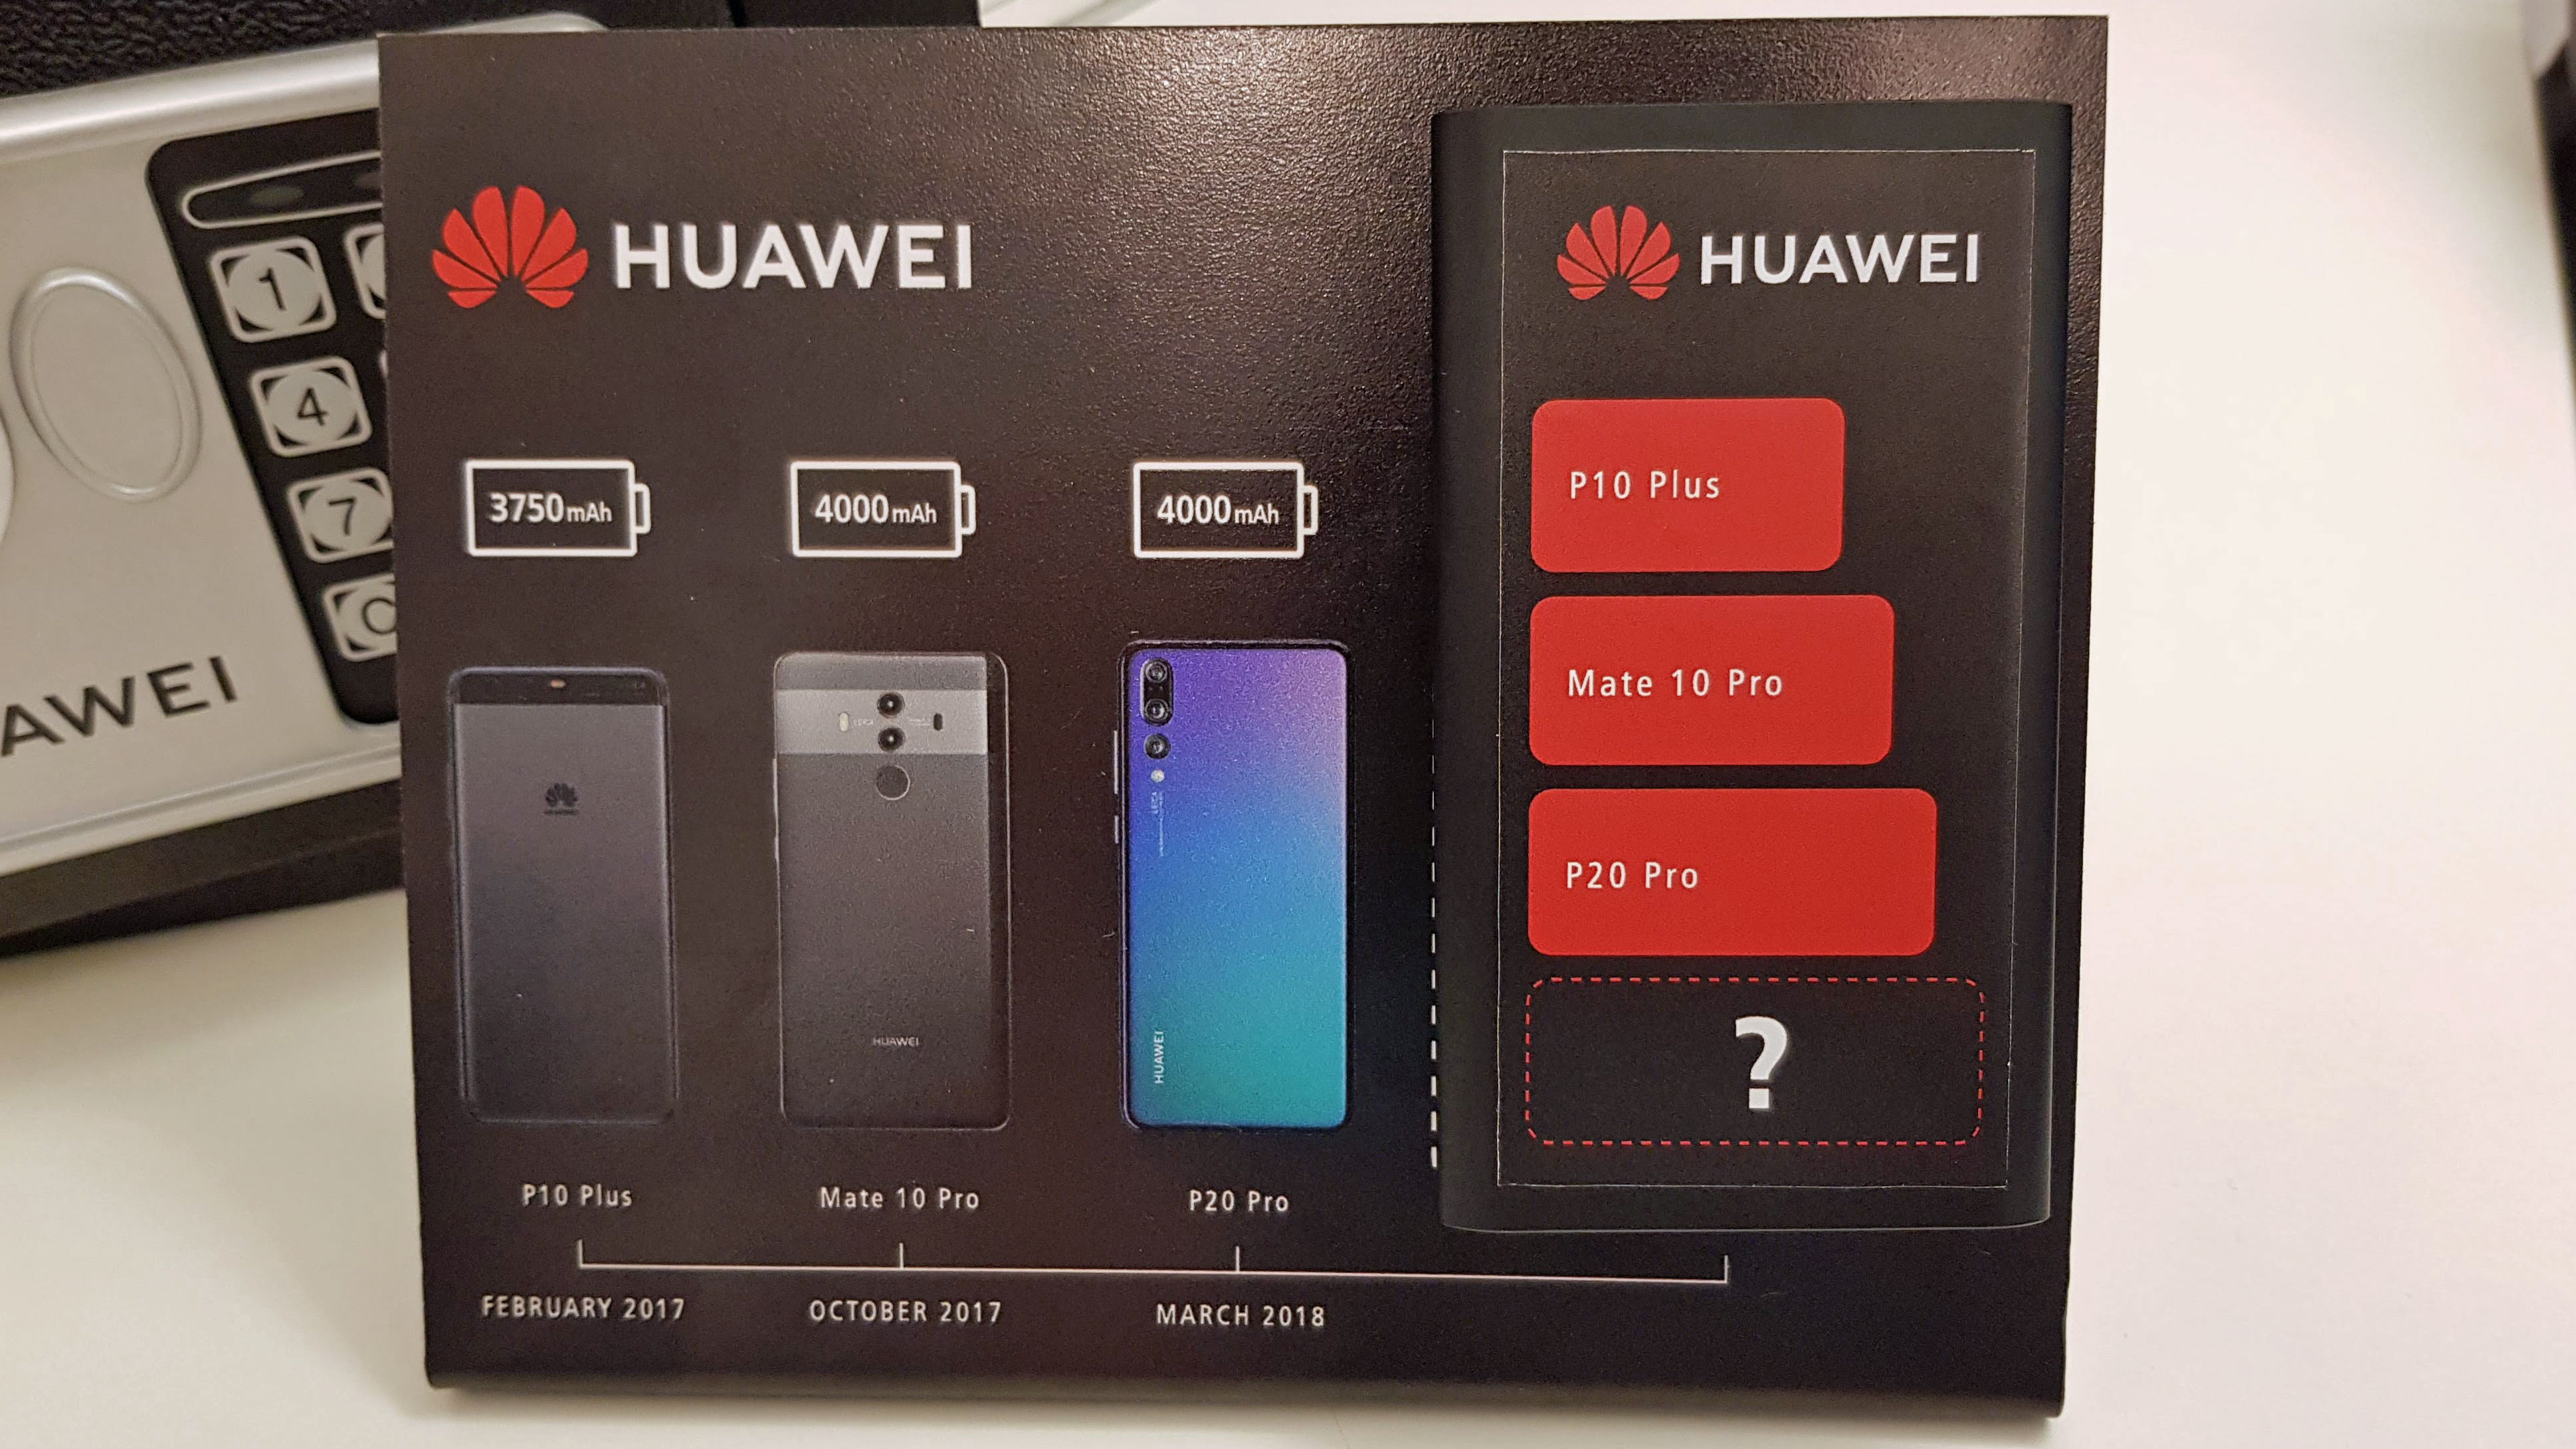 Huawei Mate teaser suggests it'll 4ia2rw72QGsnnsMPvQ5N